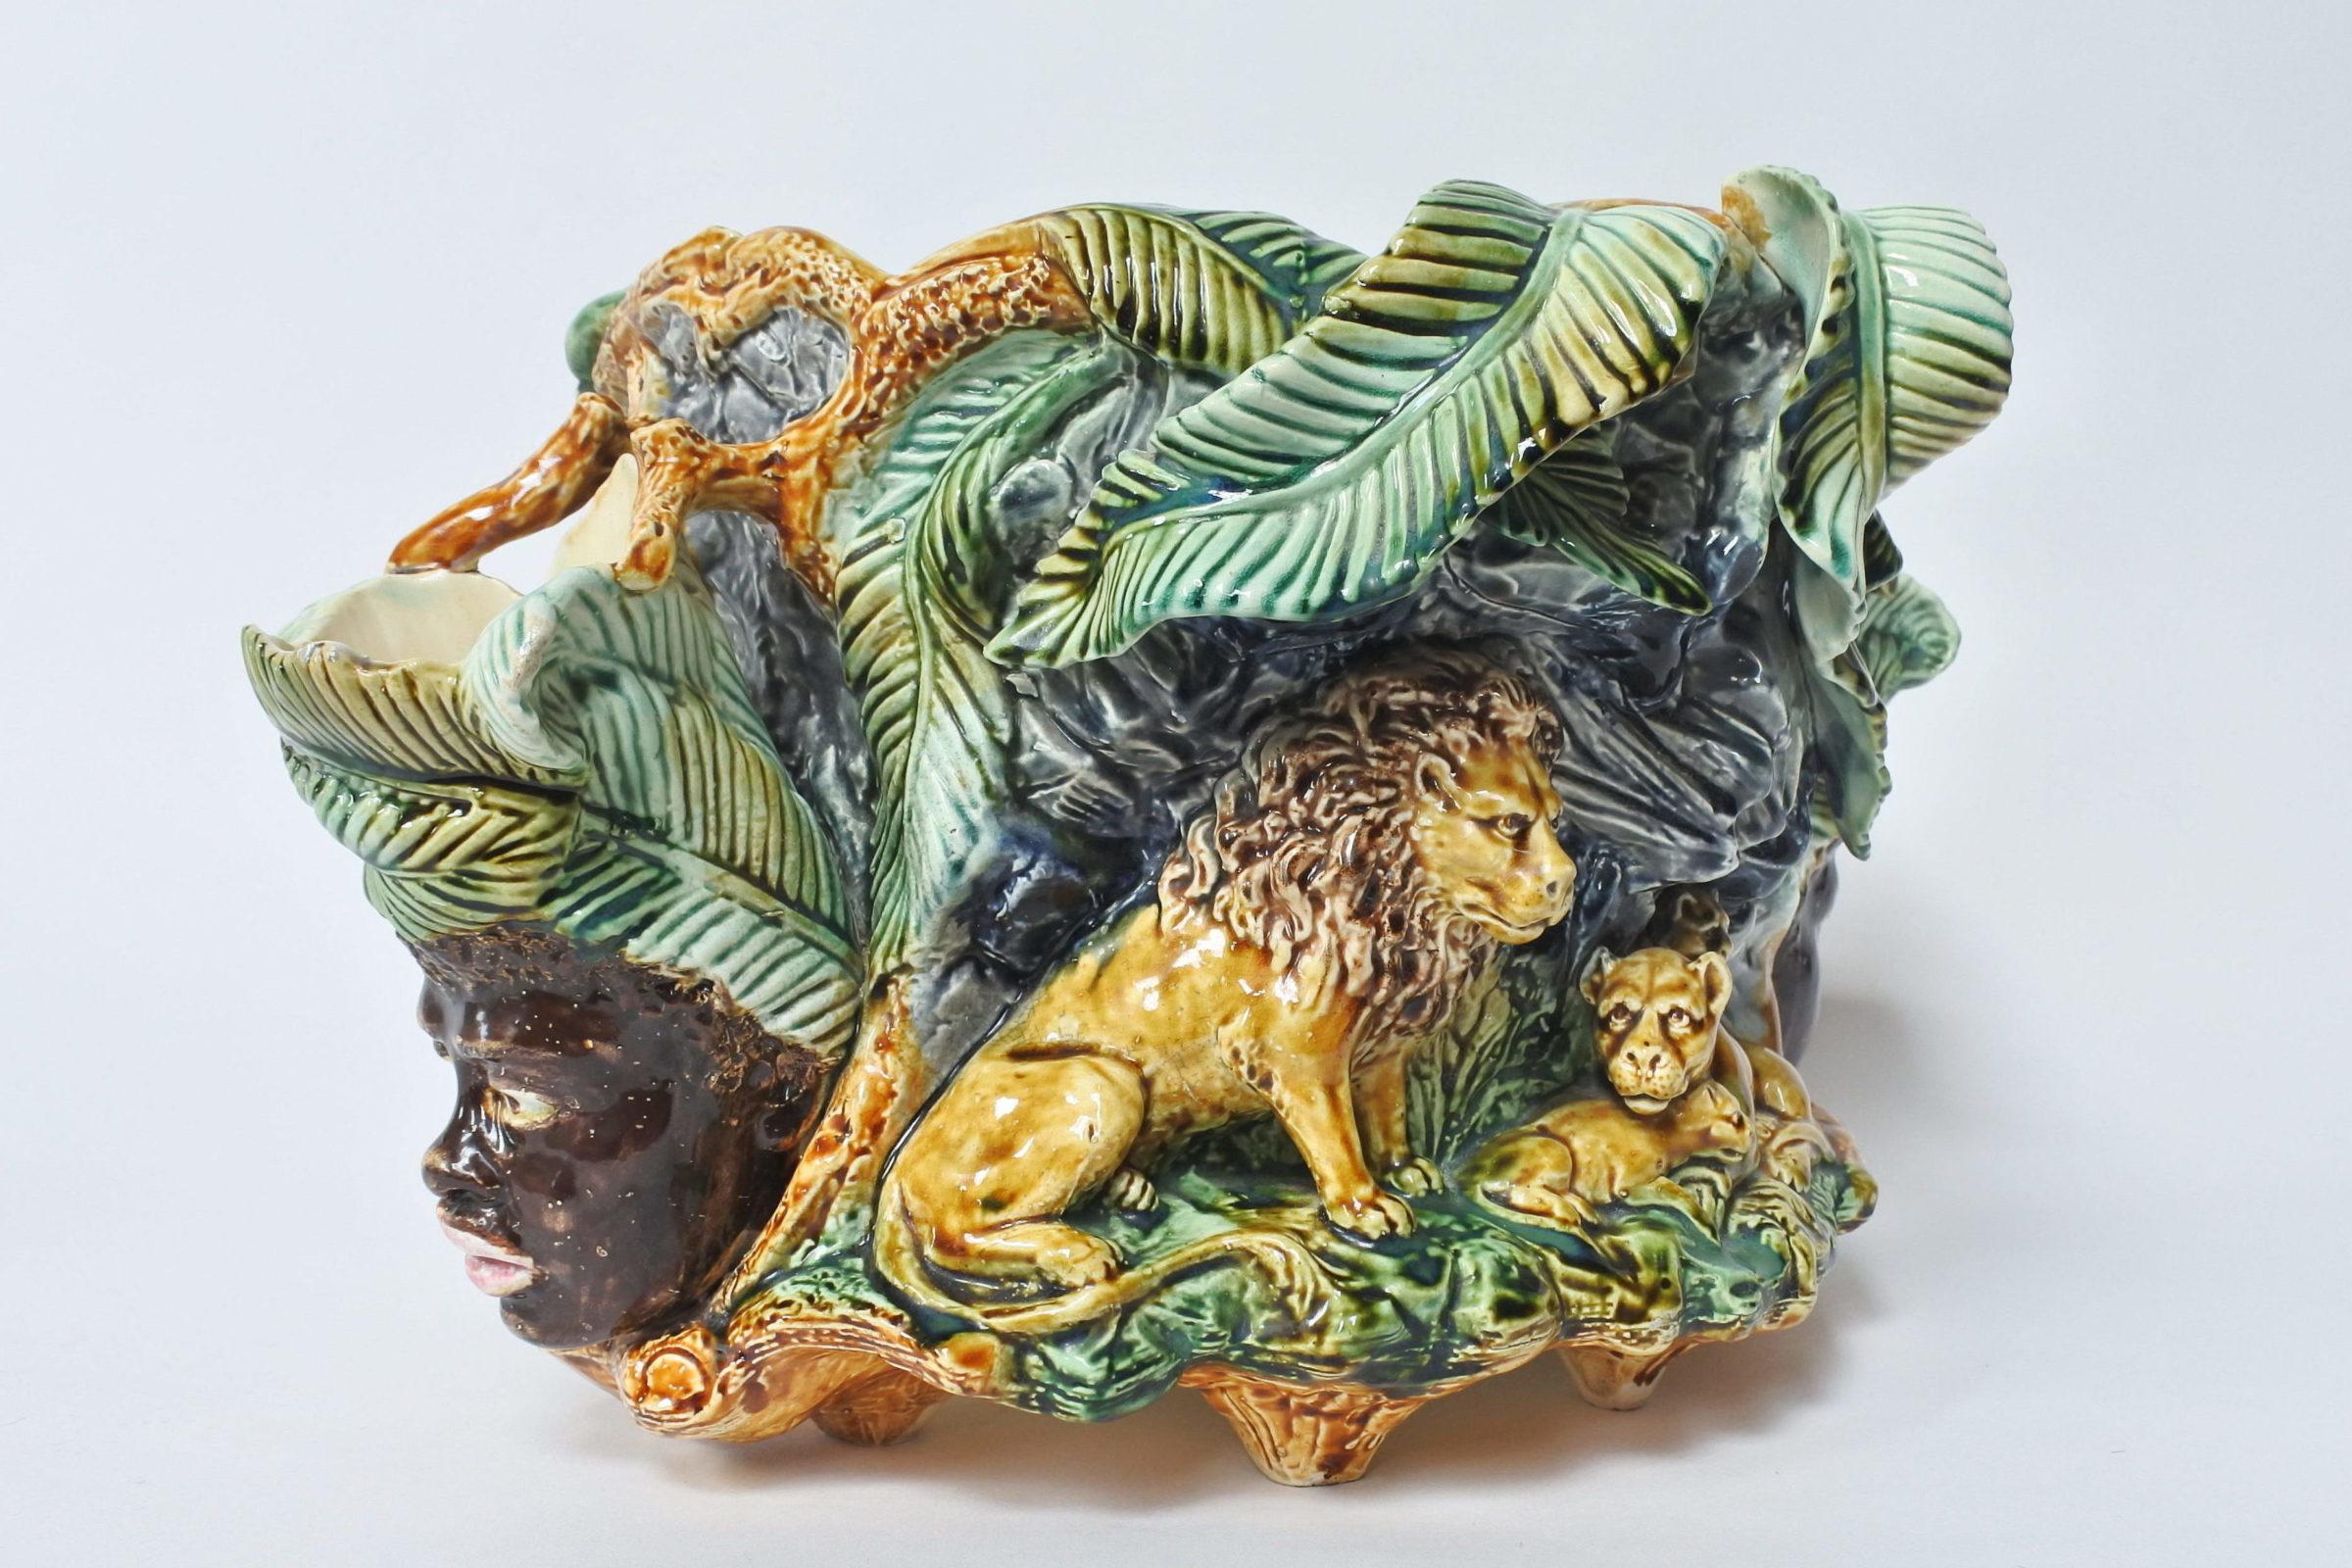 Centrotavola in ceramica barbotine con funzione di jardinière - Onnaing - 2